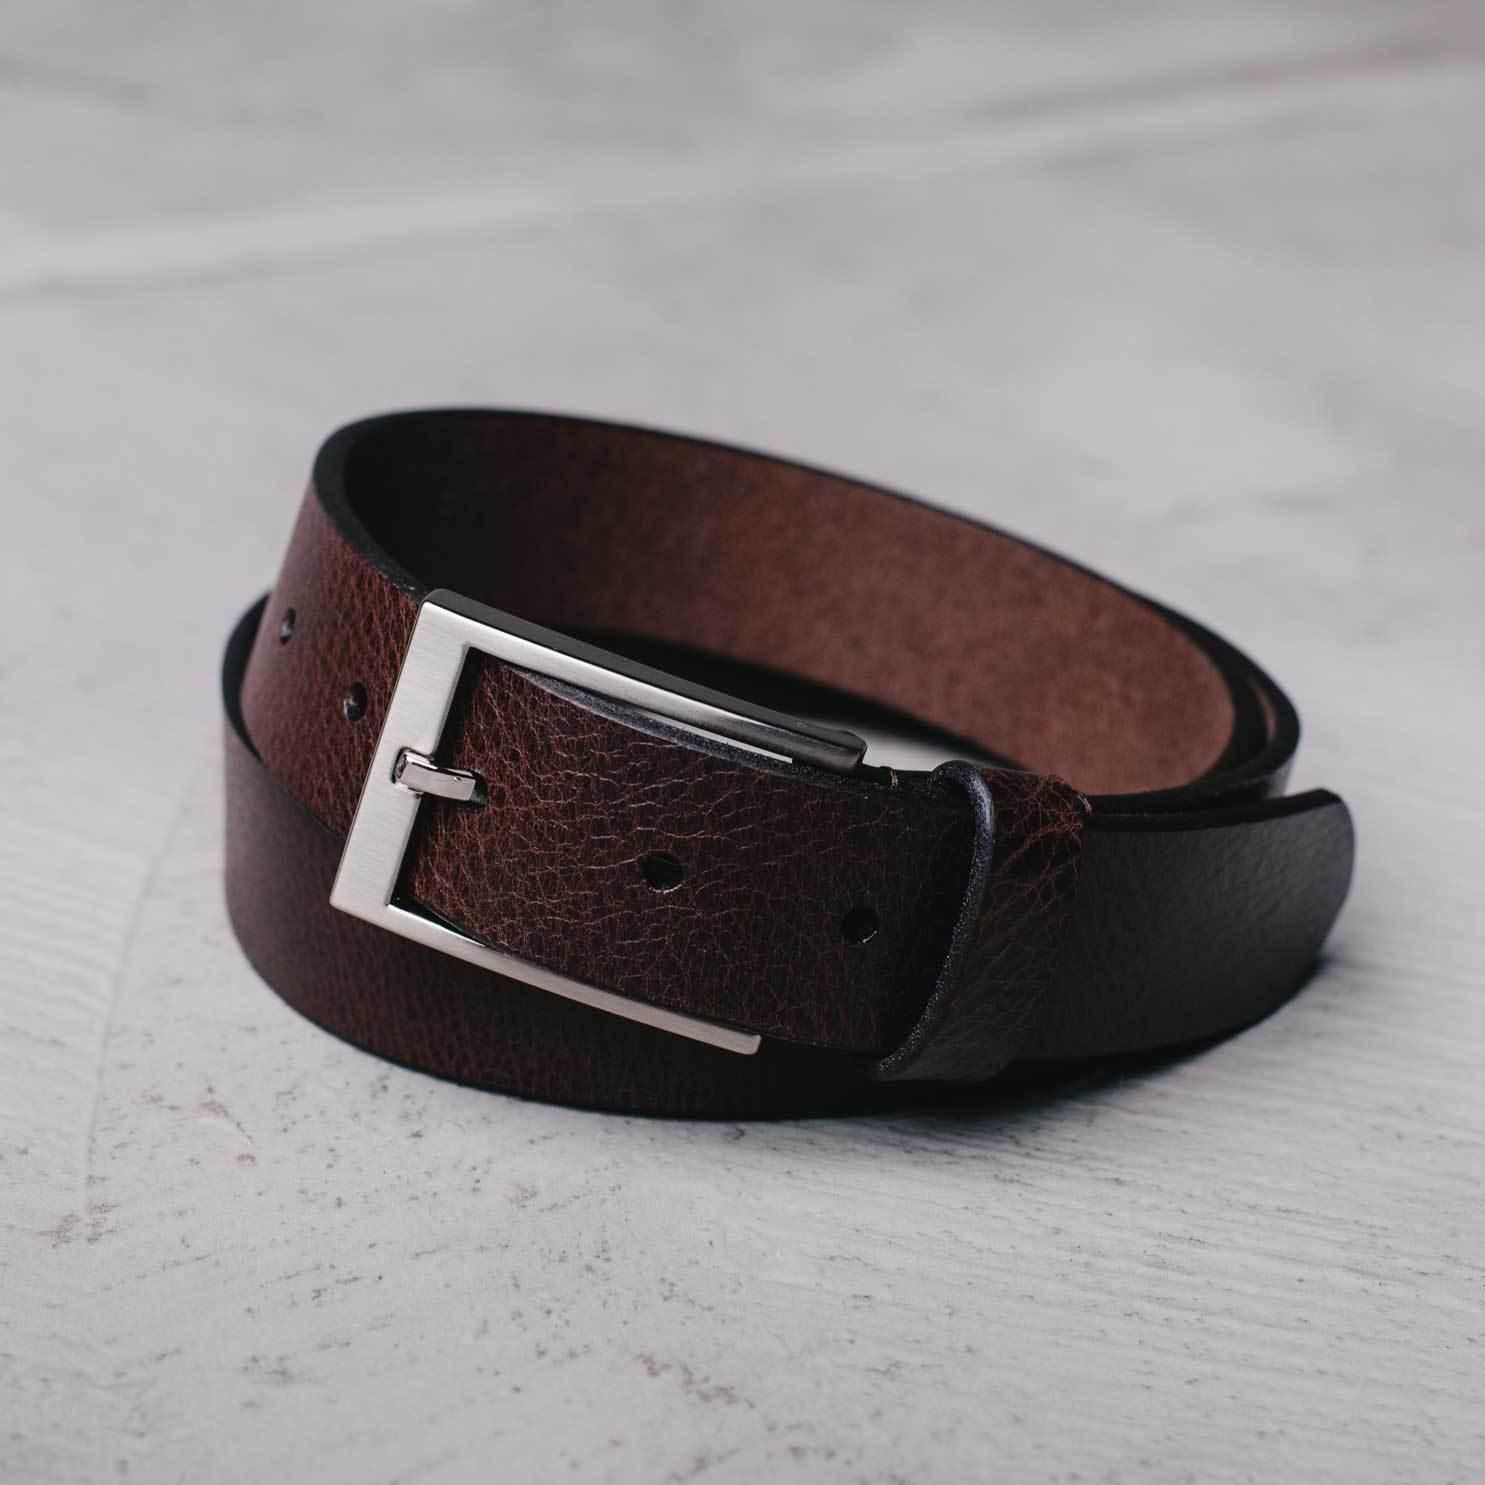 mens-thin-brown-leather-belt-DSTLD.jpg